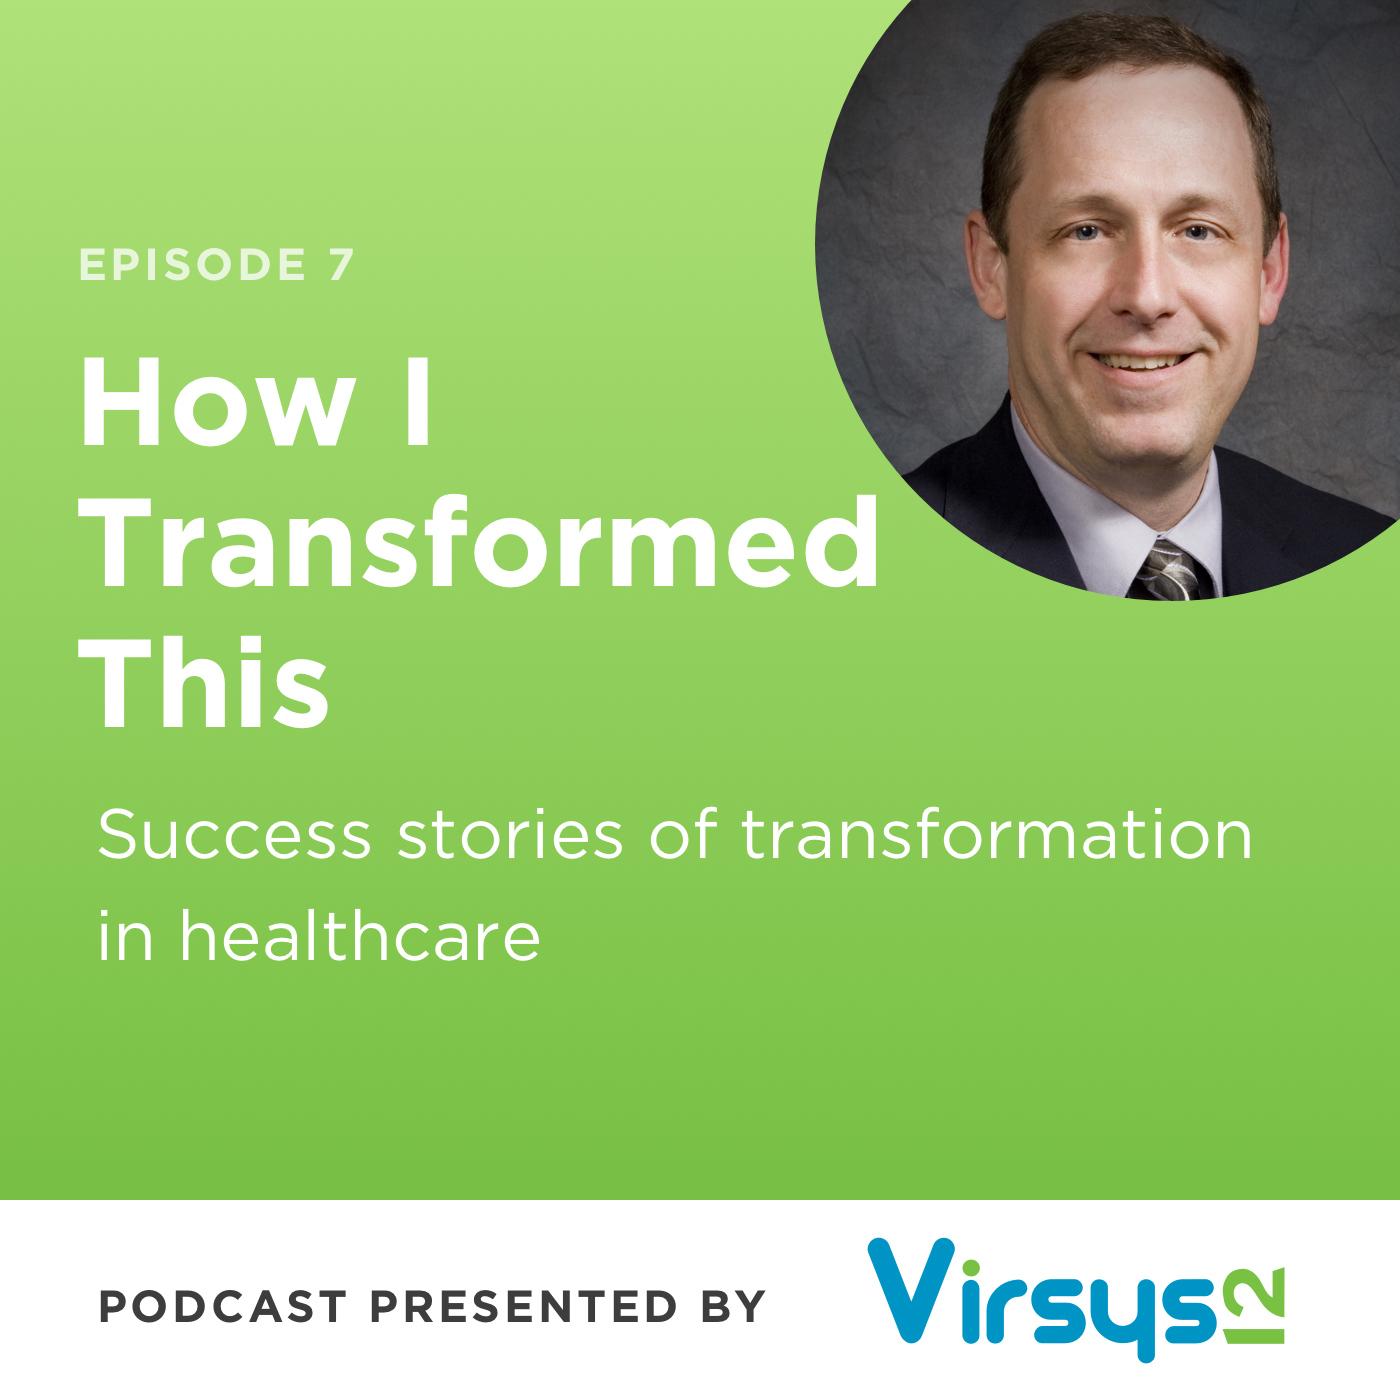 Bob Martin: Prioritizing Compassionate Care with New Technology